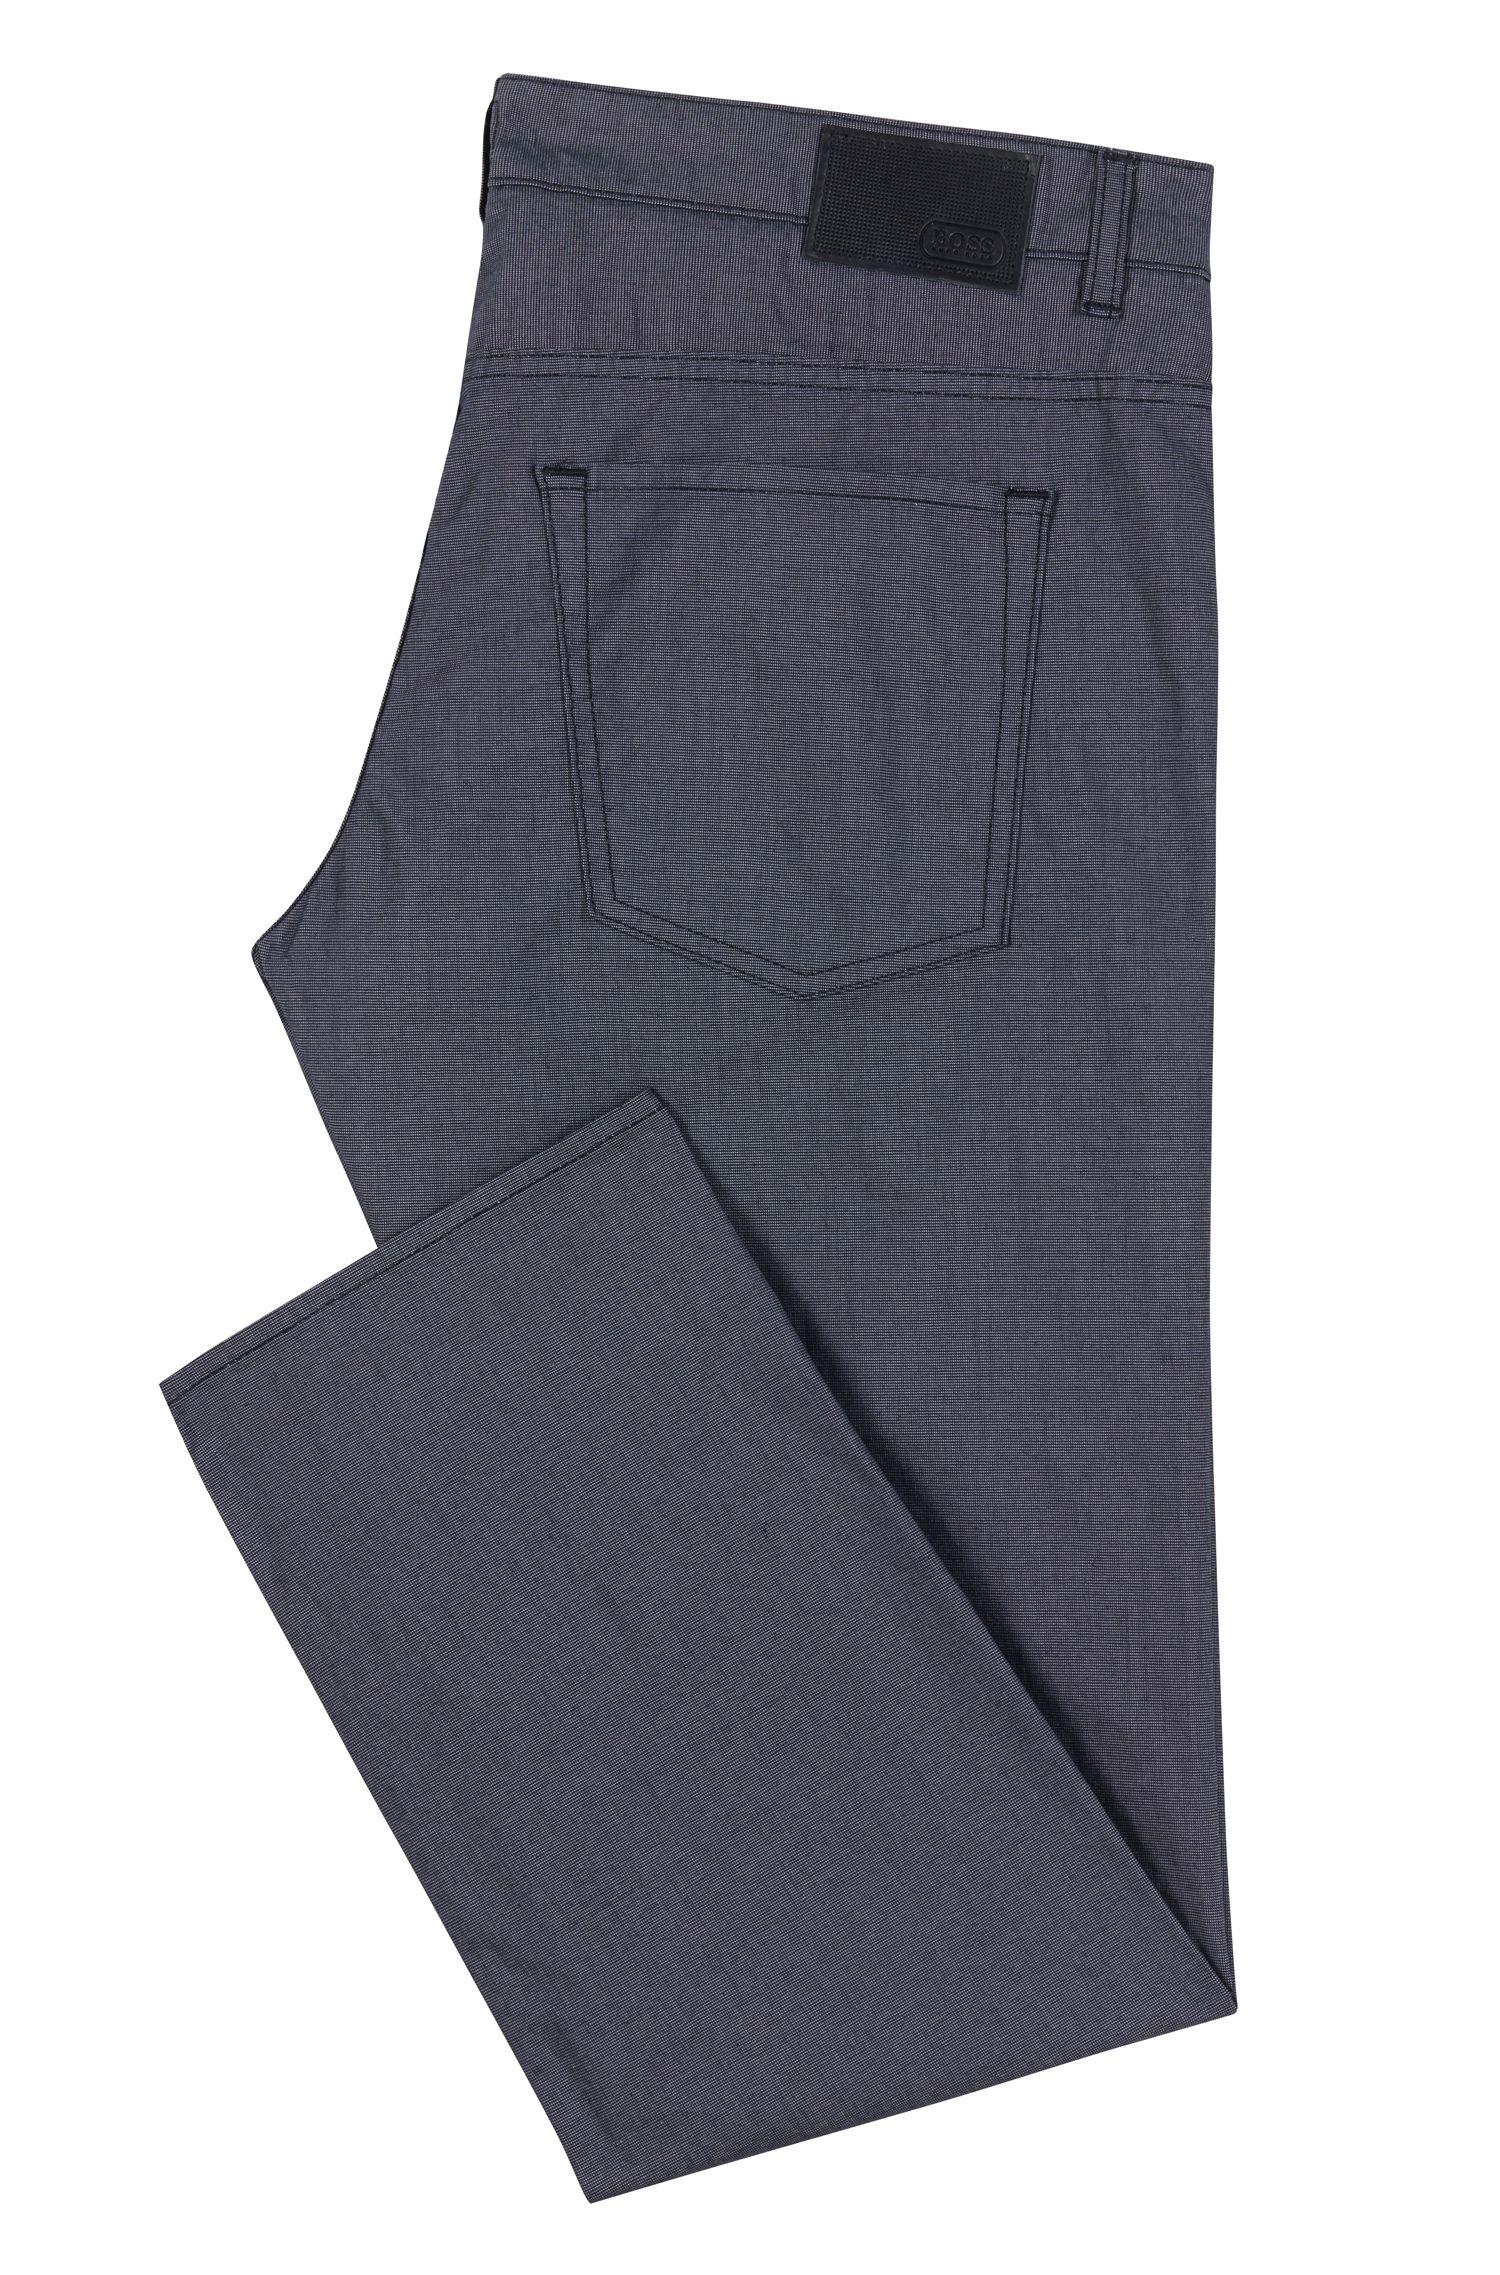 Stretch Cotton Jean, Slim FIt | C-Delaware, Dark Blue